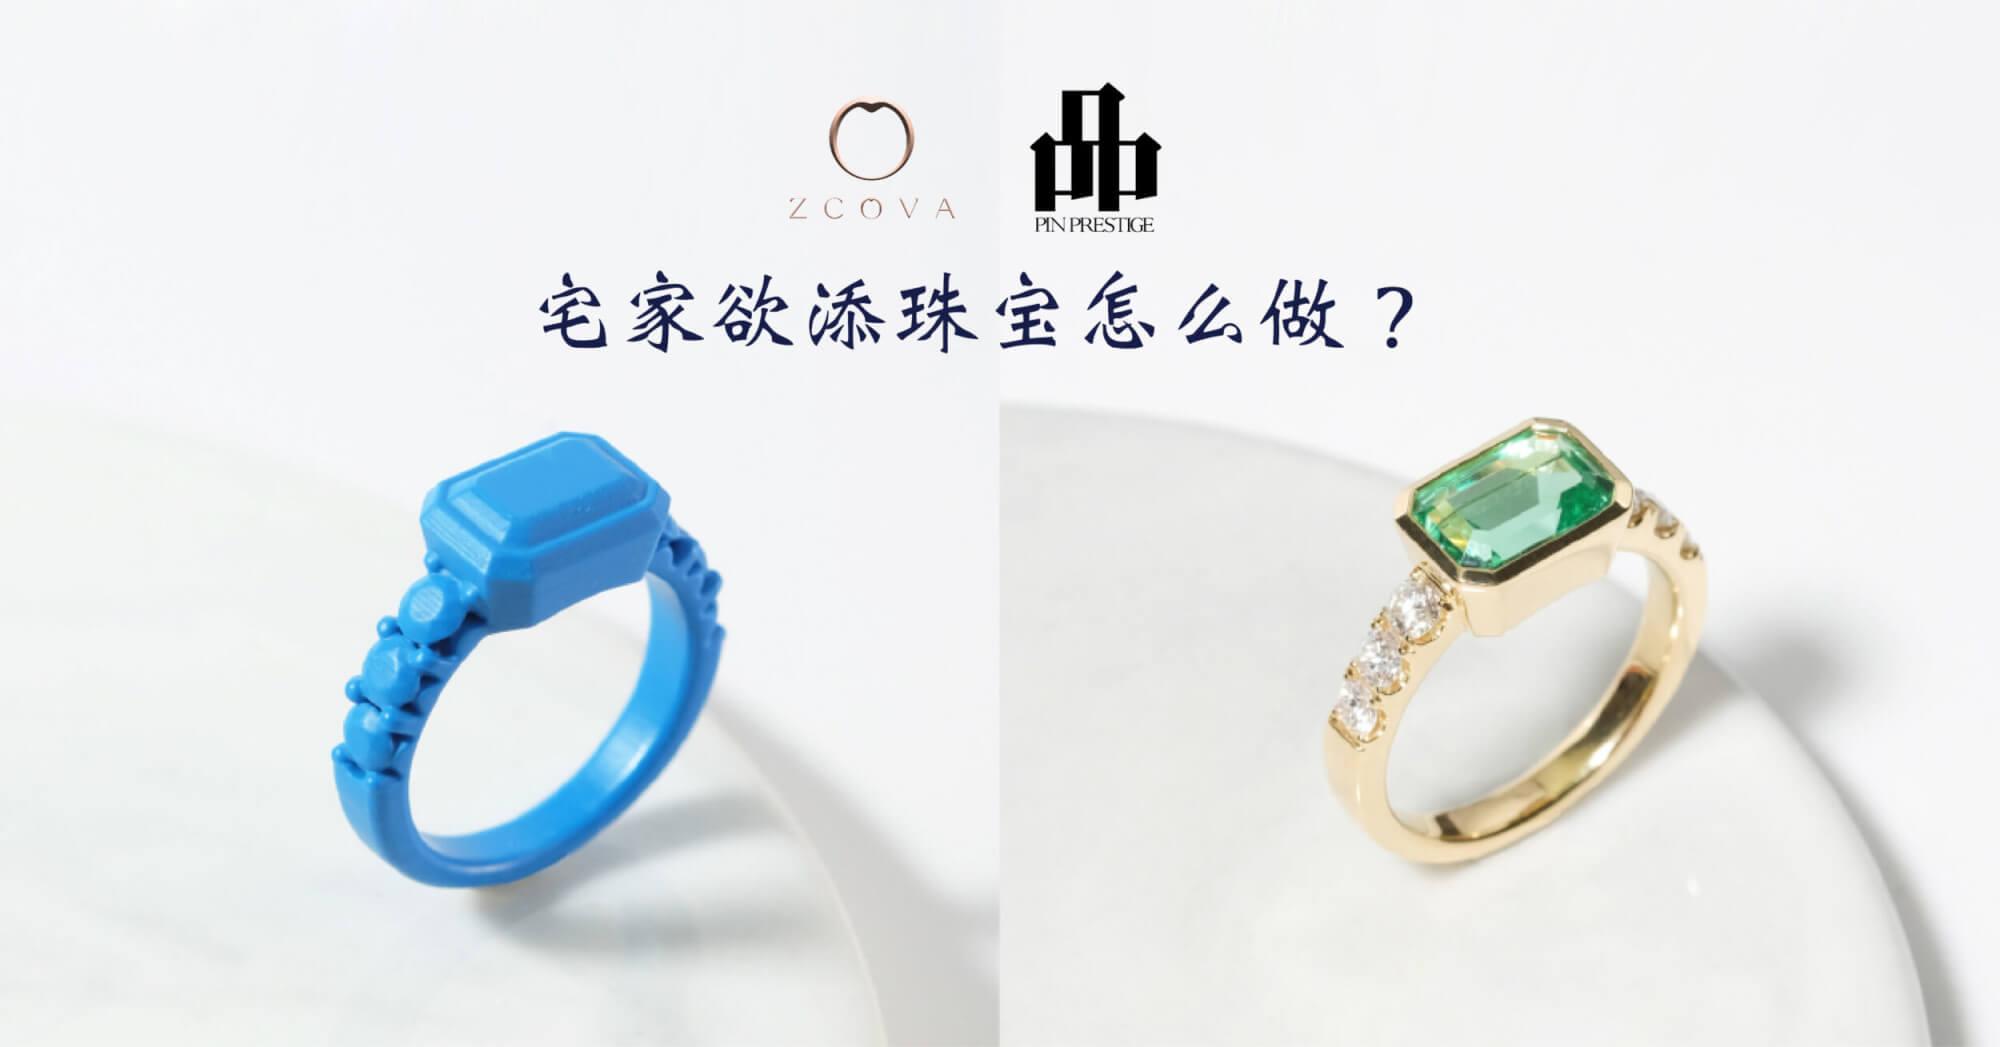 ZCOVA in Pin Prestige Customise Diamond and Gemstone Jewellery